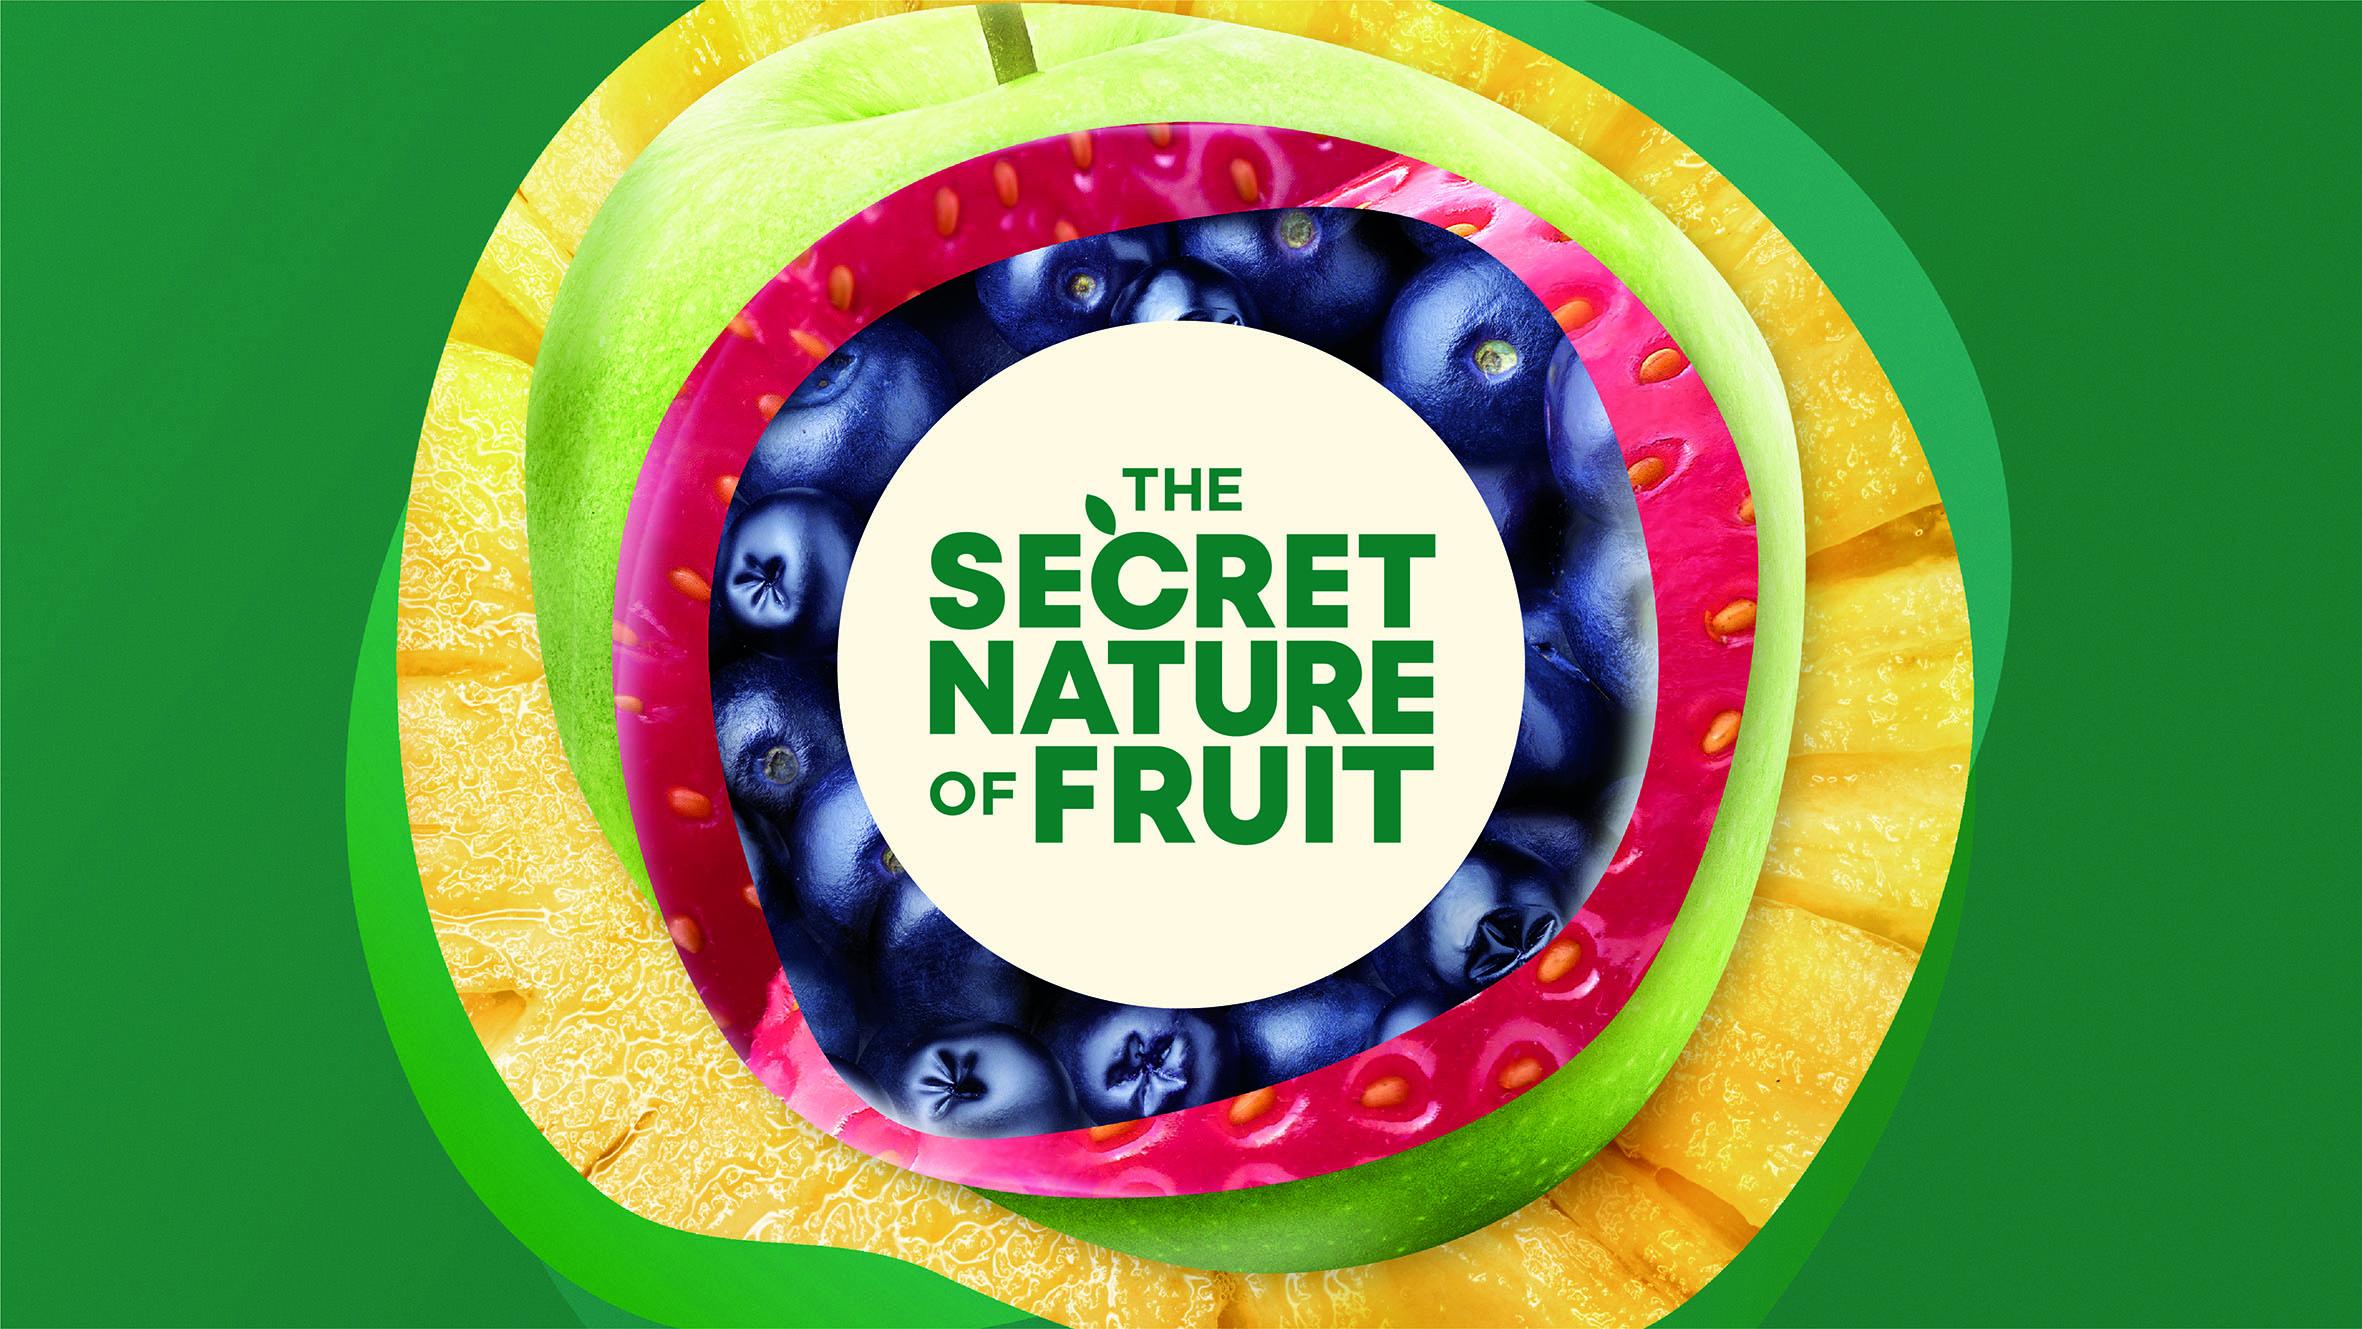 1HQ Creates New Fruit-Forward Supplement Brand, The Secret Nature of Fruit